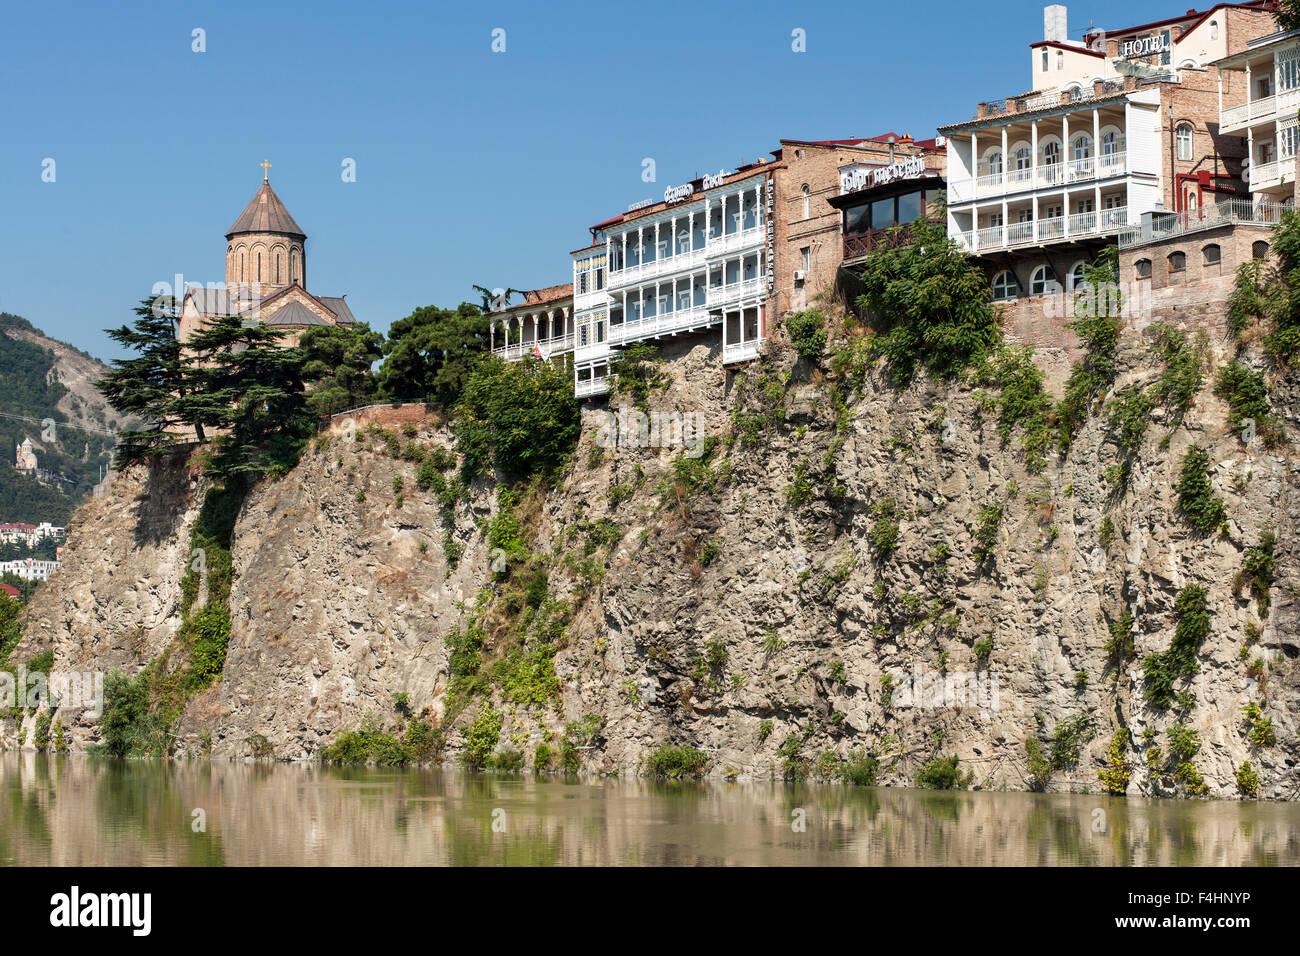 The Metekhi church and buildings lining the Kura River in Tbilisi, the capital of Georgia. Stock Photo